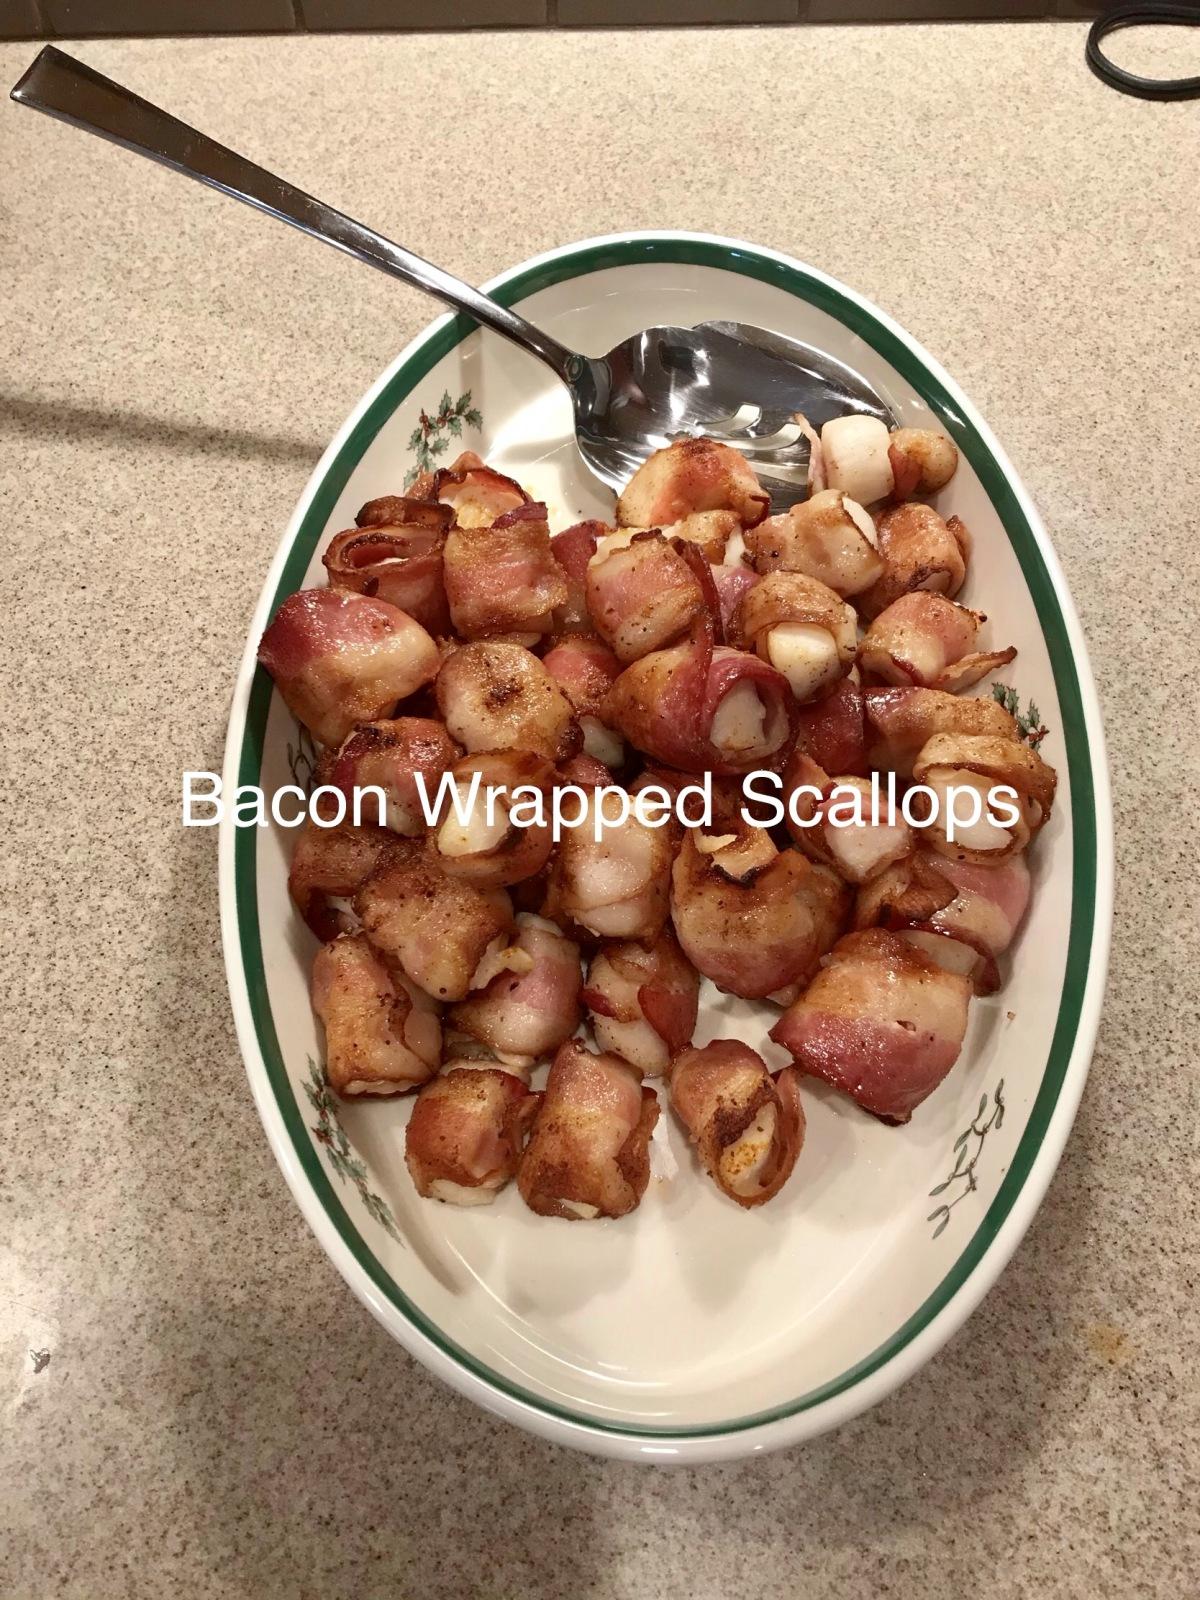 baconwrappedscallops 122818.jpg